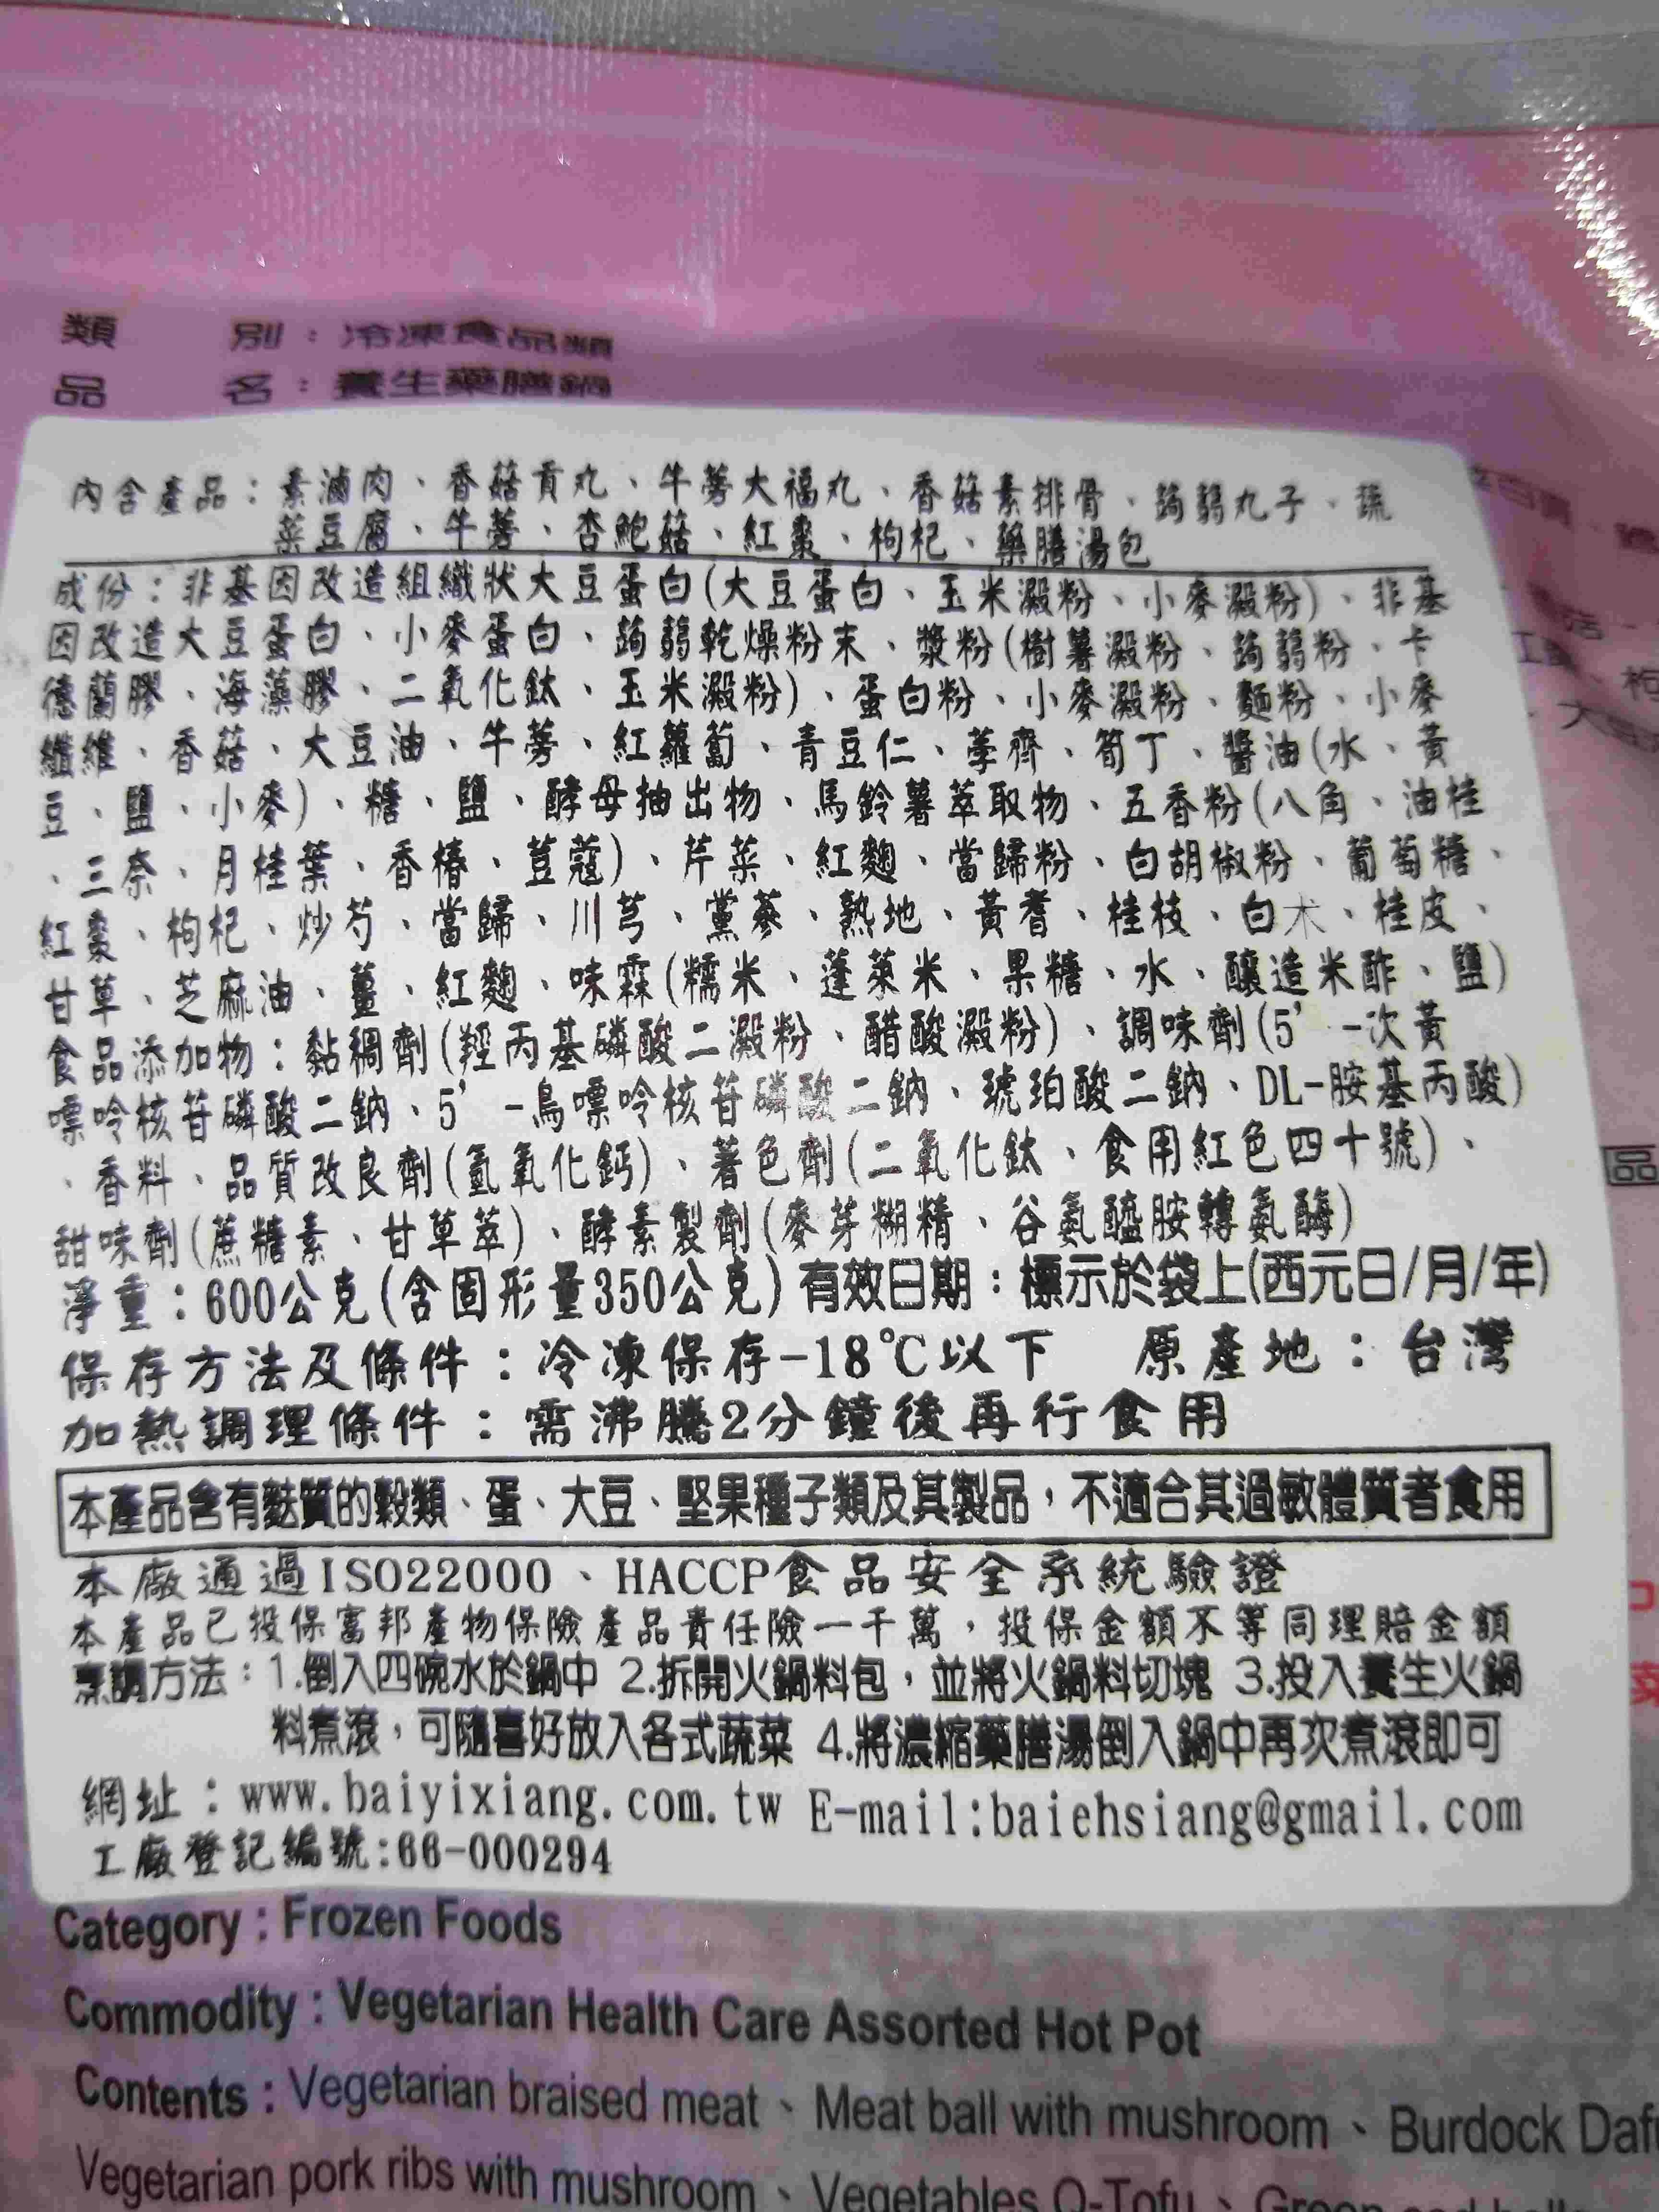 Image Yao Shan Herbal Steamboat 连厨 - 养生药膳火锅 600grams